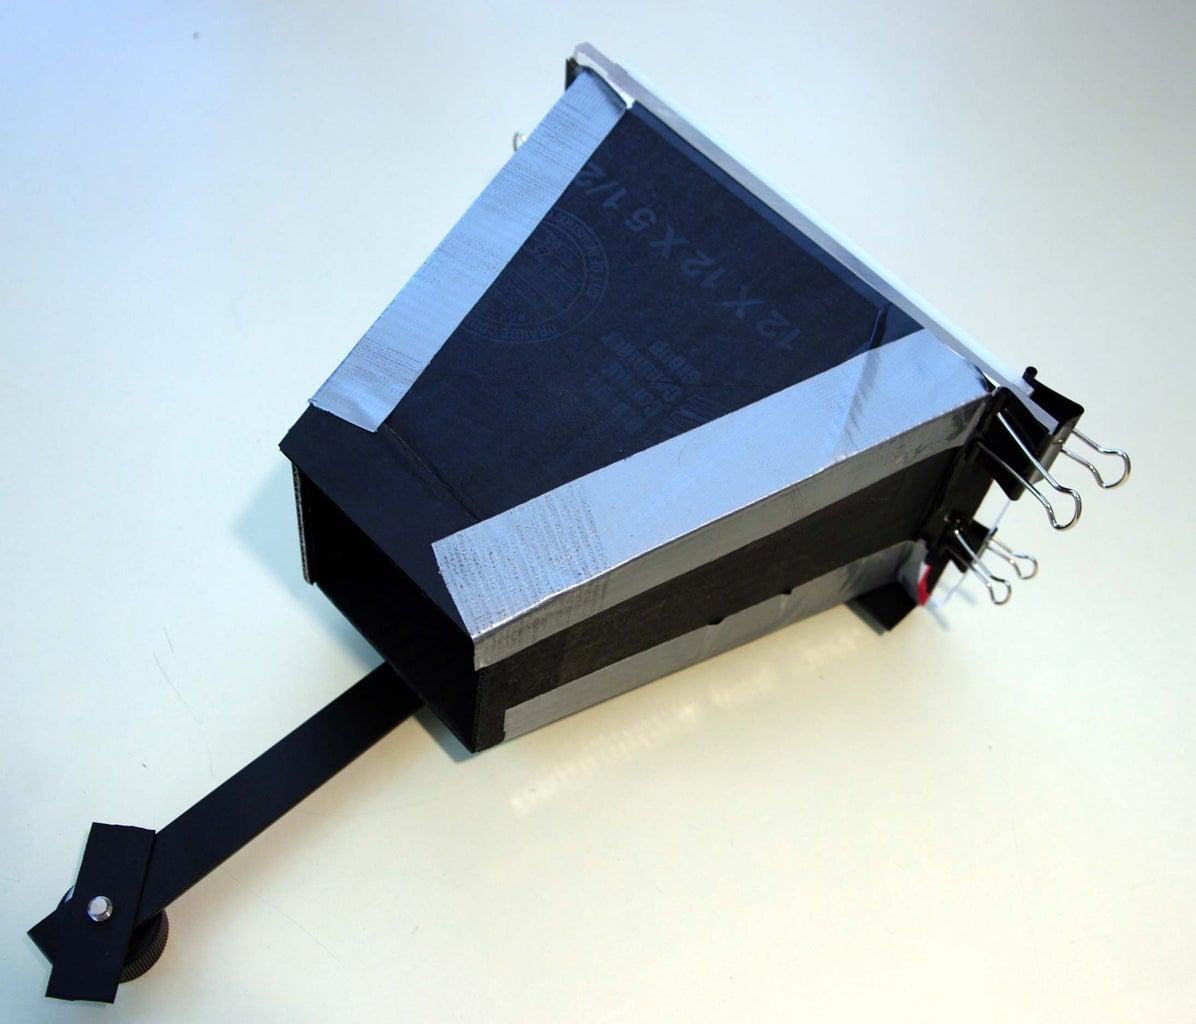 Assembling the Light Shield